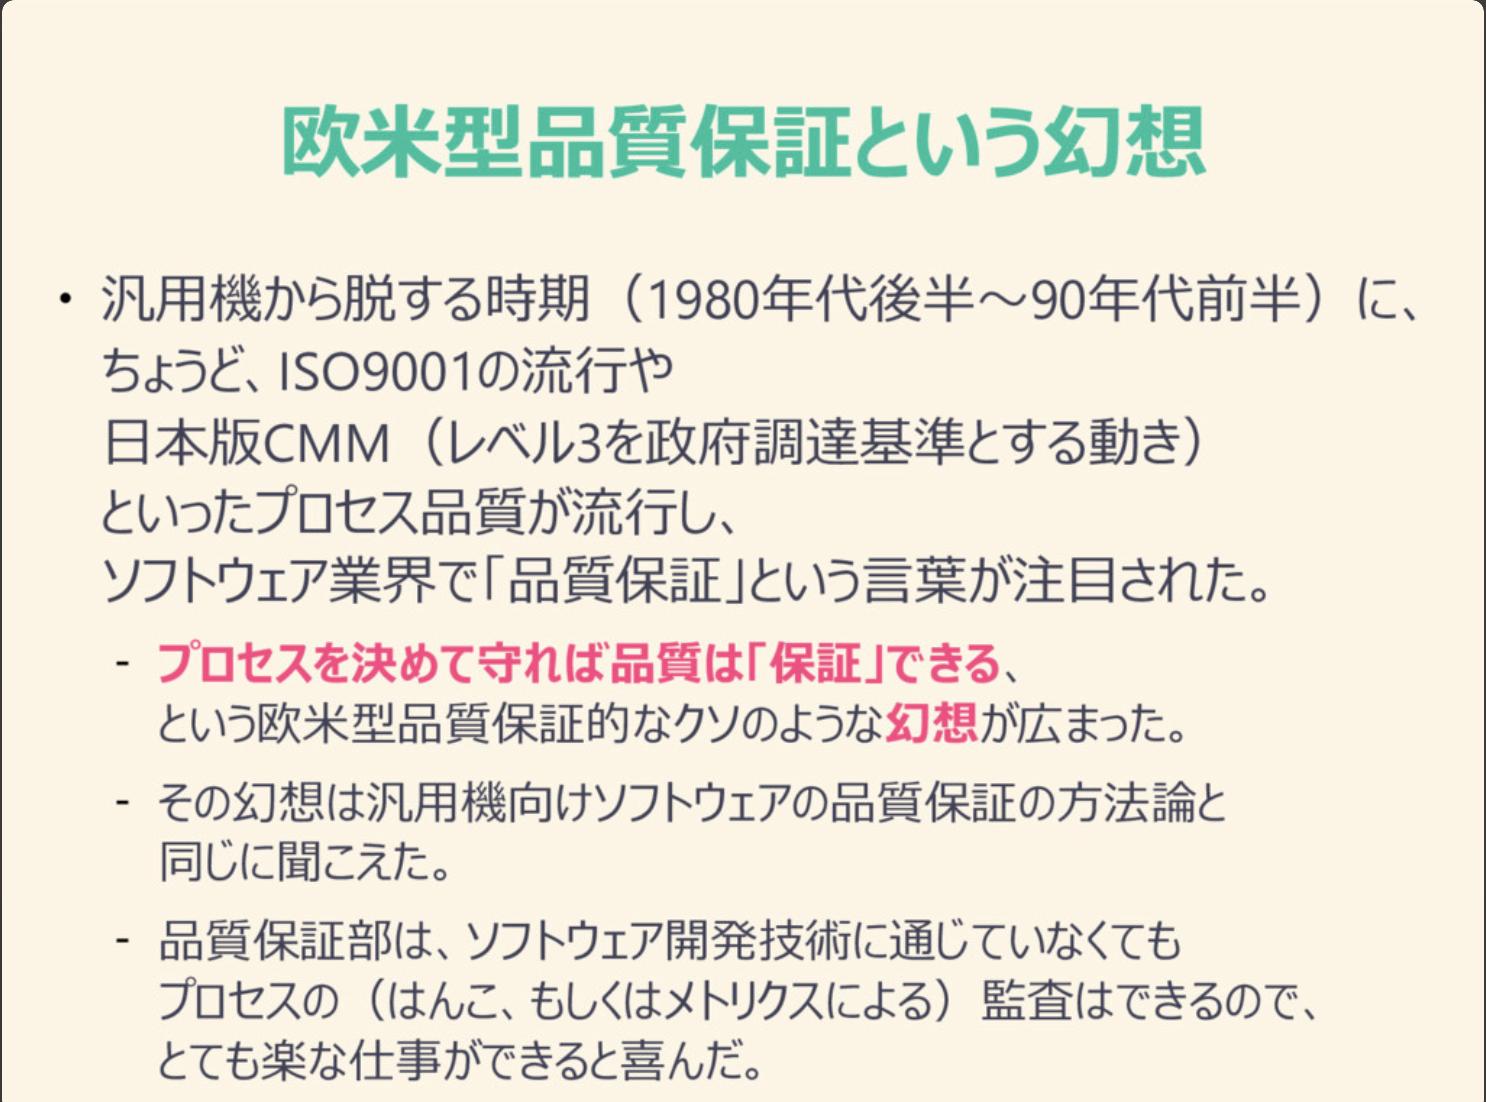 f:id:nihonbuson:20210519102249p:plain